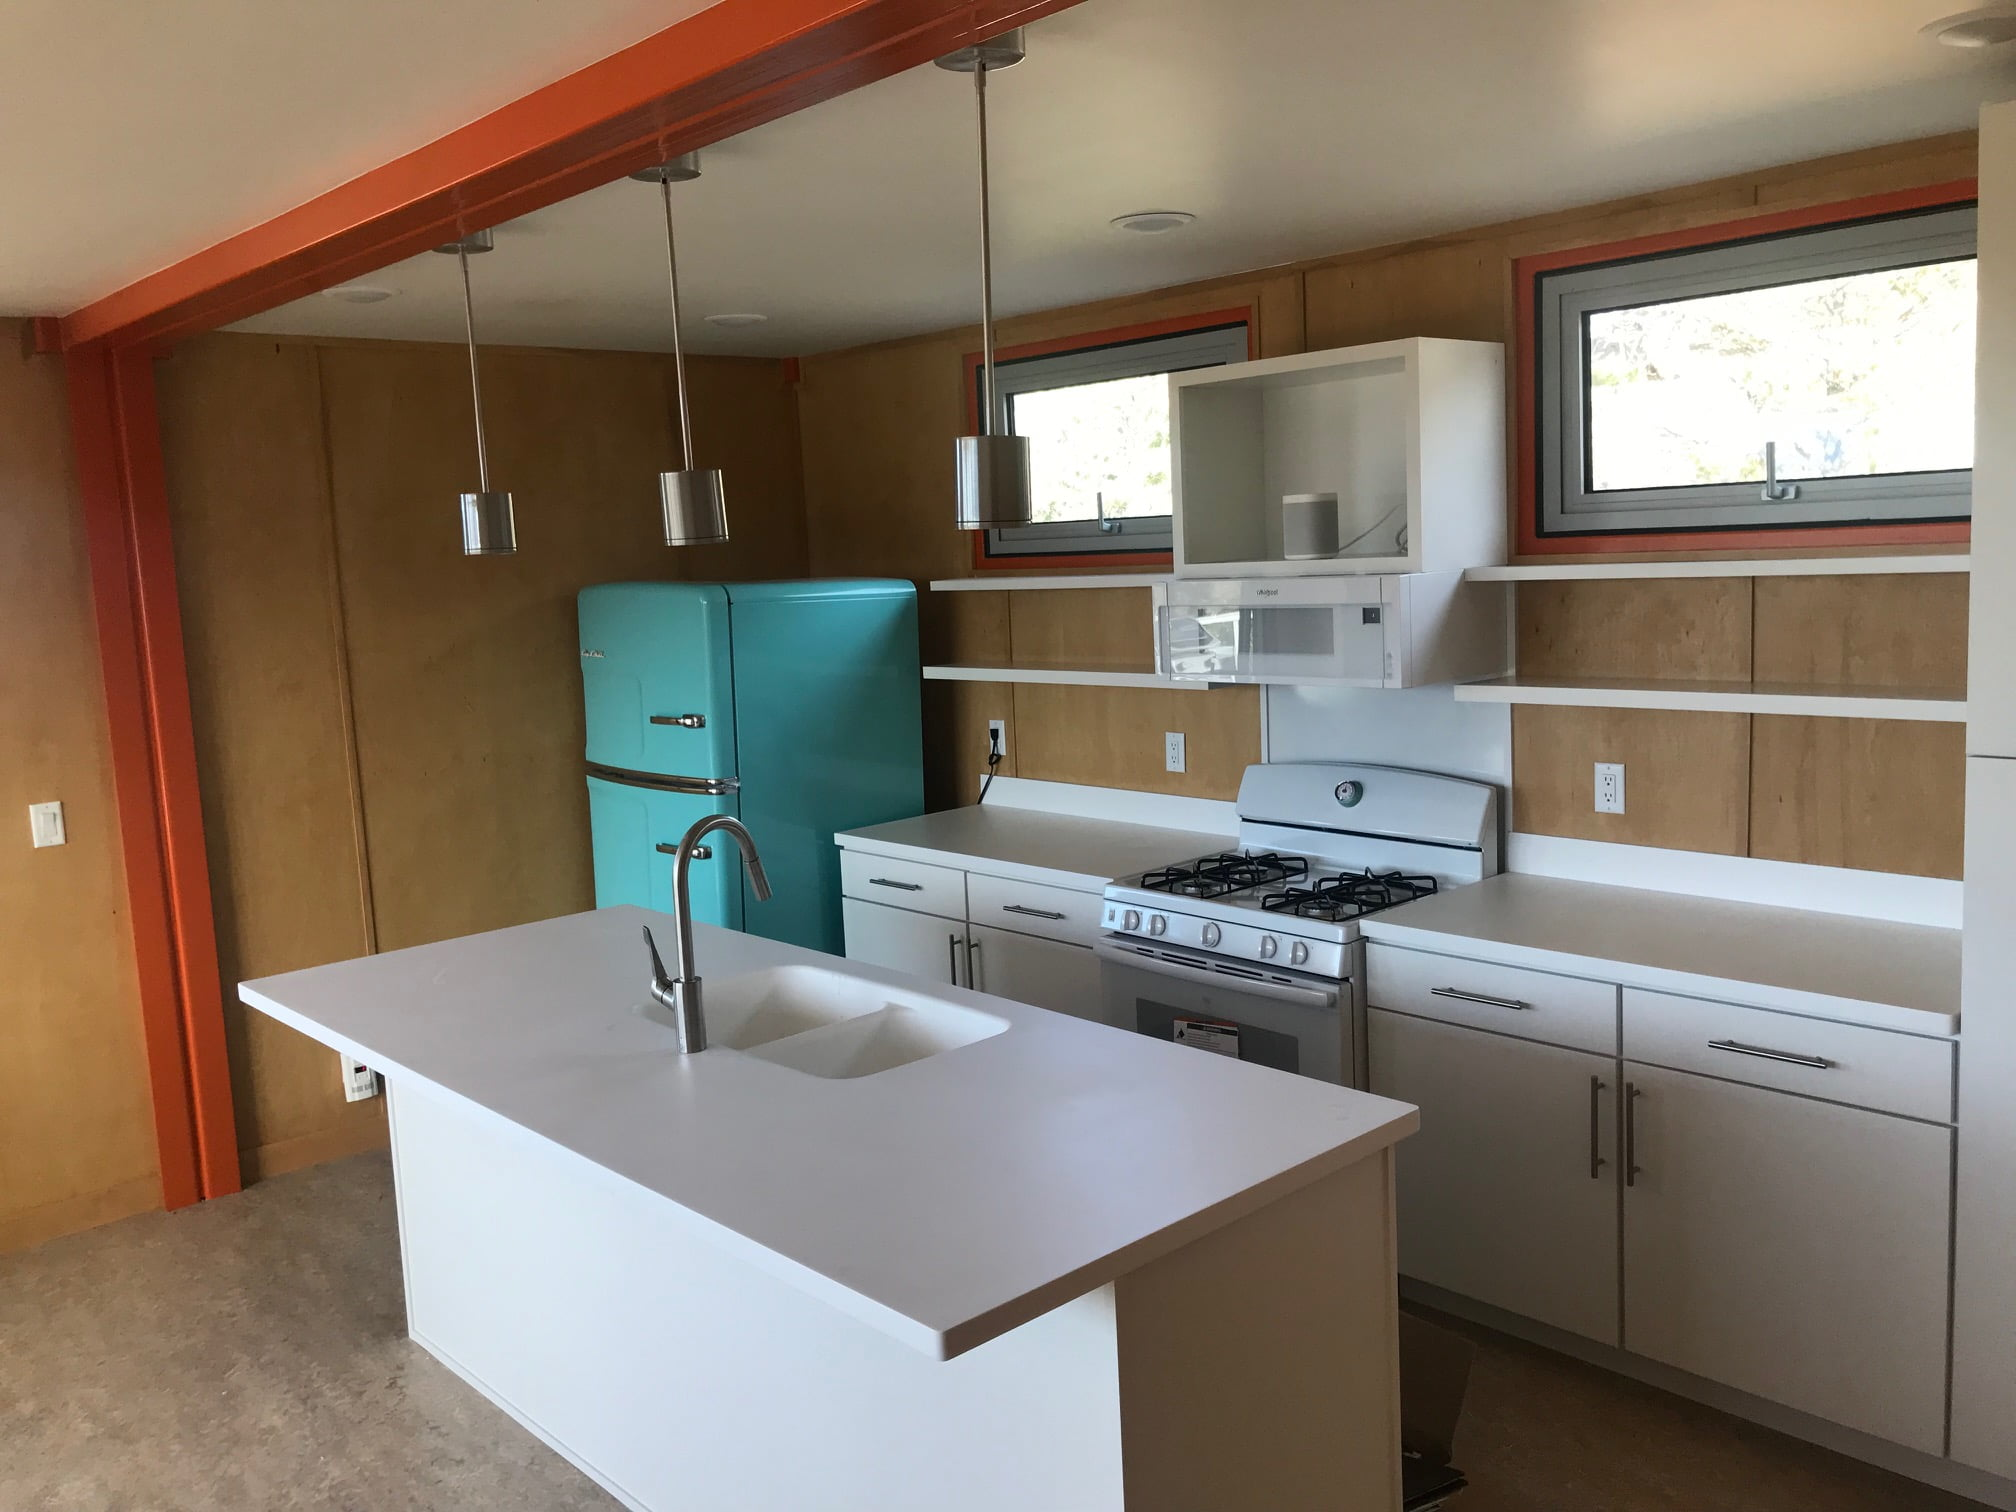 Prefab modular home